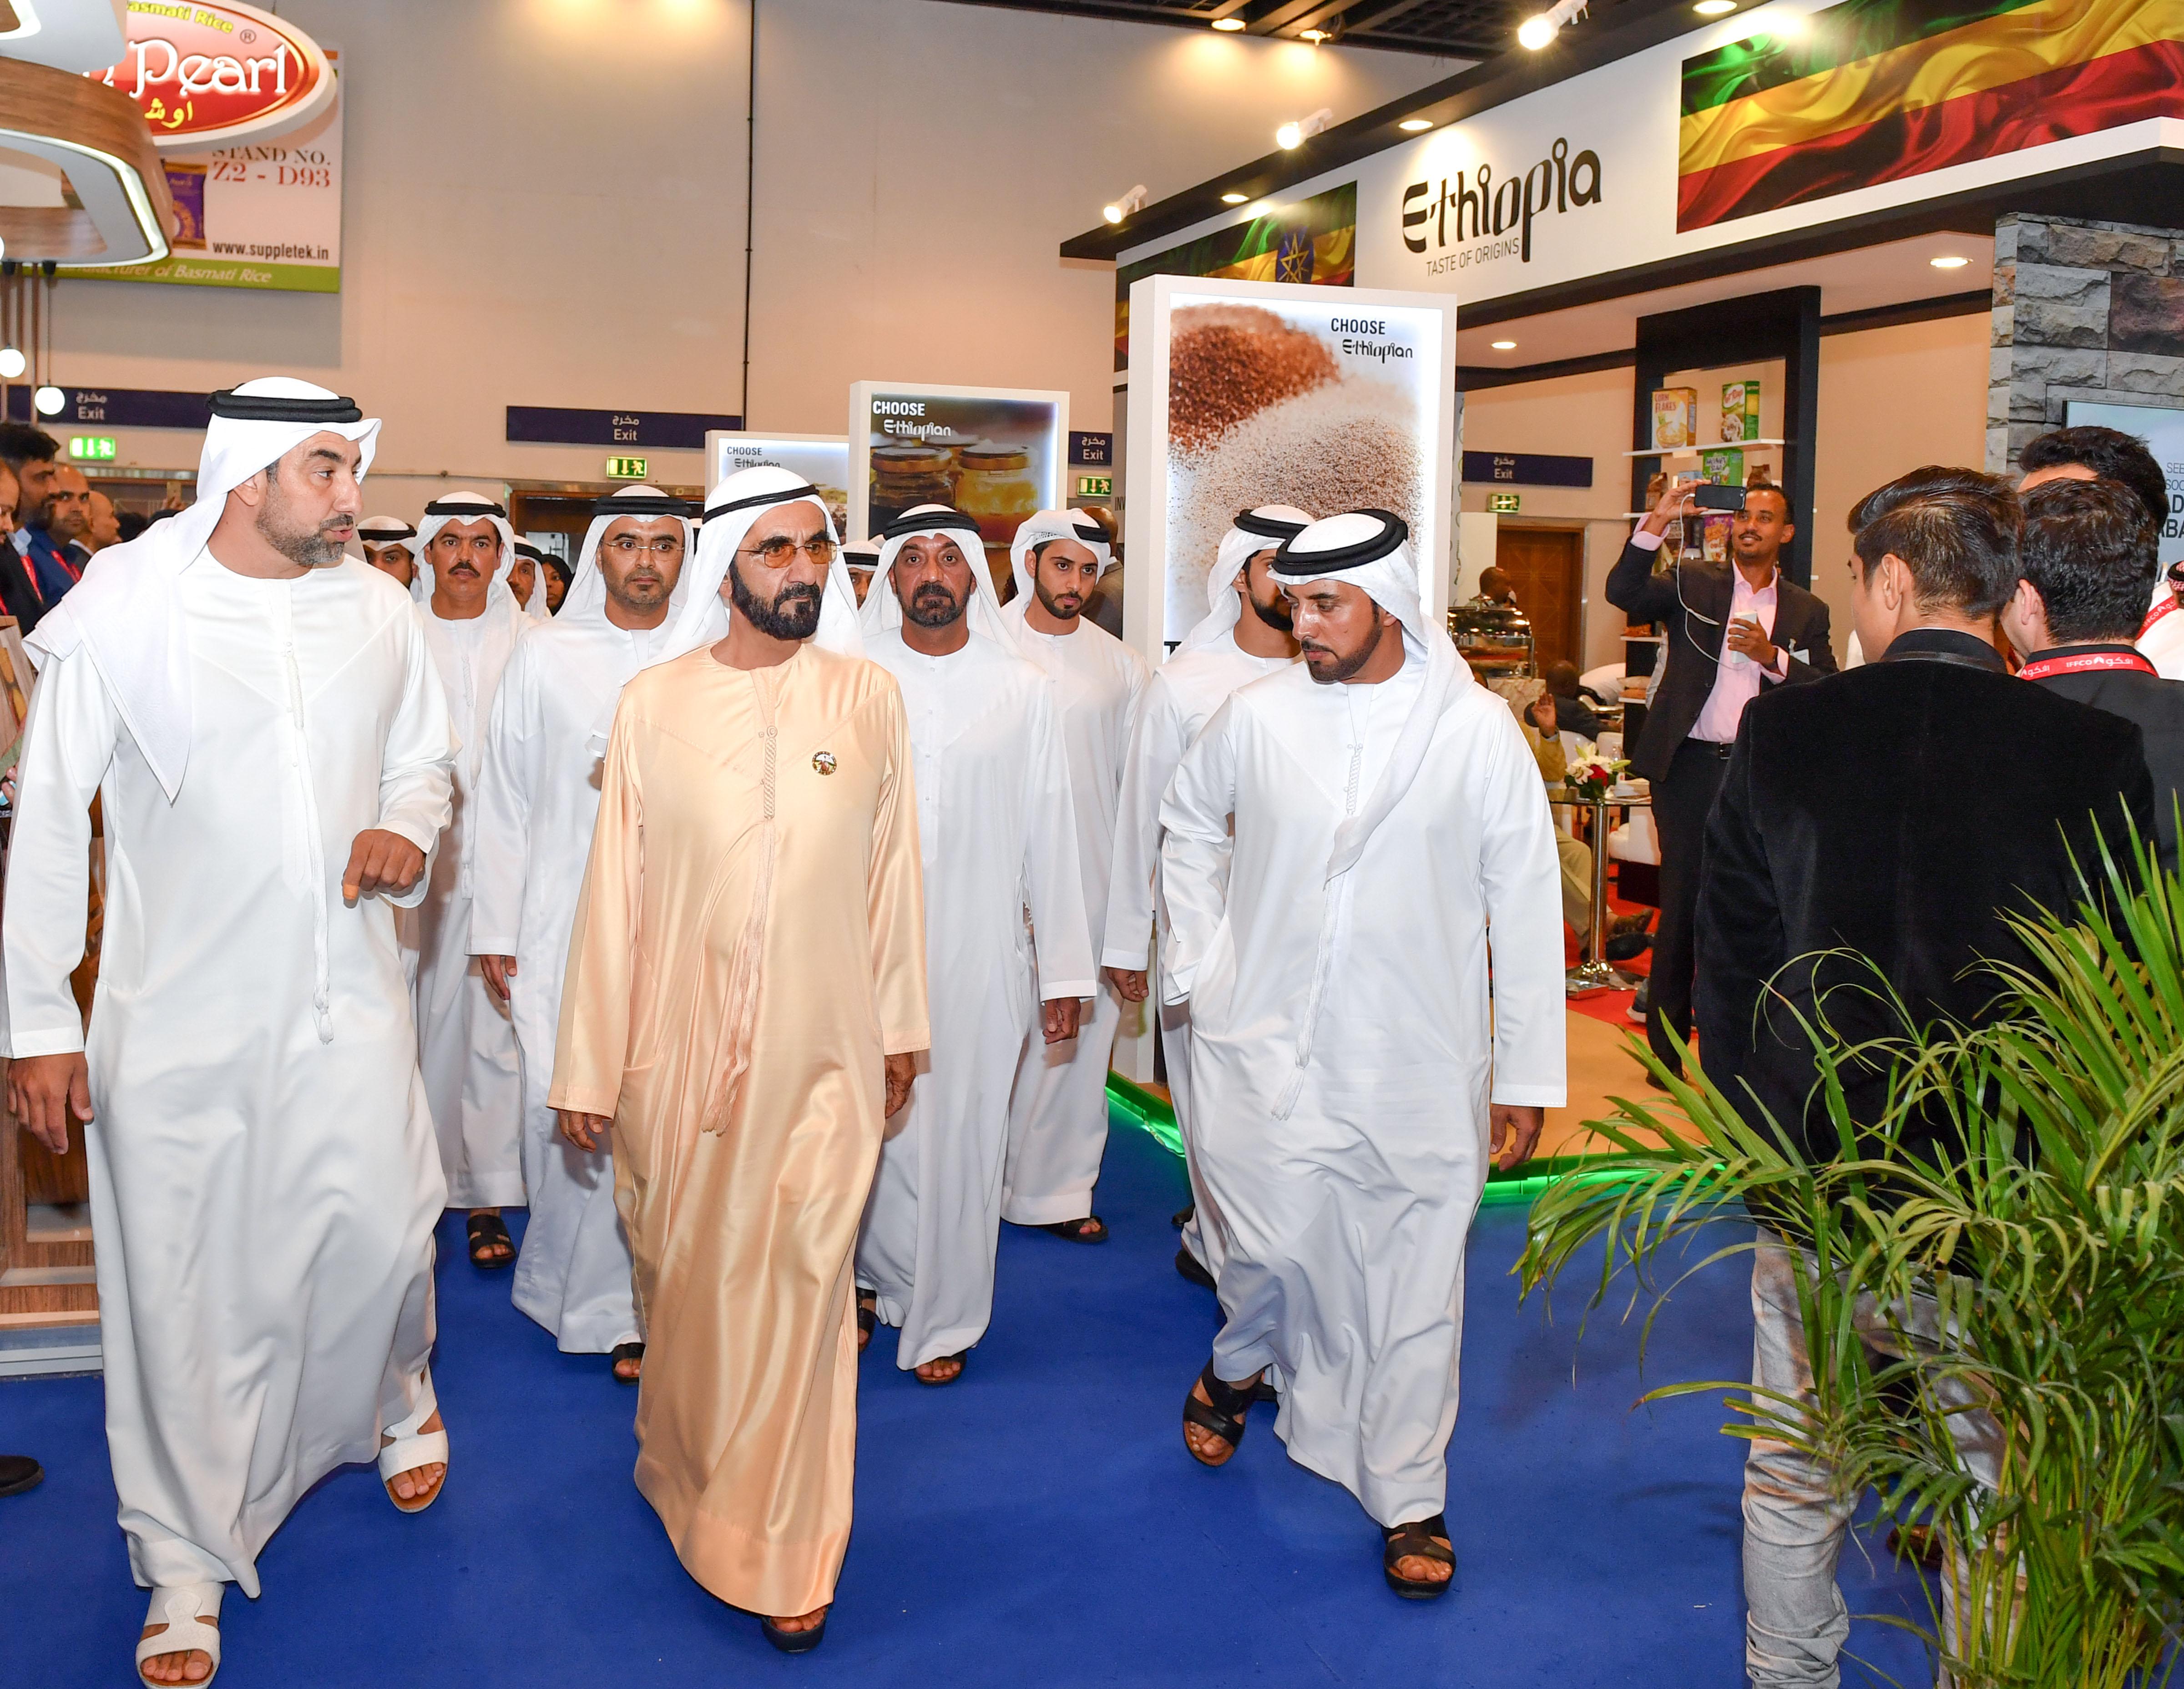 His Highness Sheikh Mohammed bin Rashid Al Maktoum - Mohammed bin Rashid visits Gulfood 2019